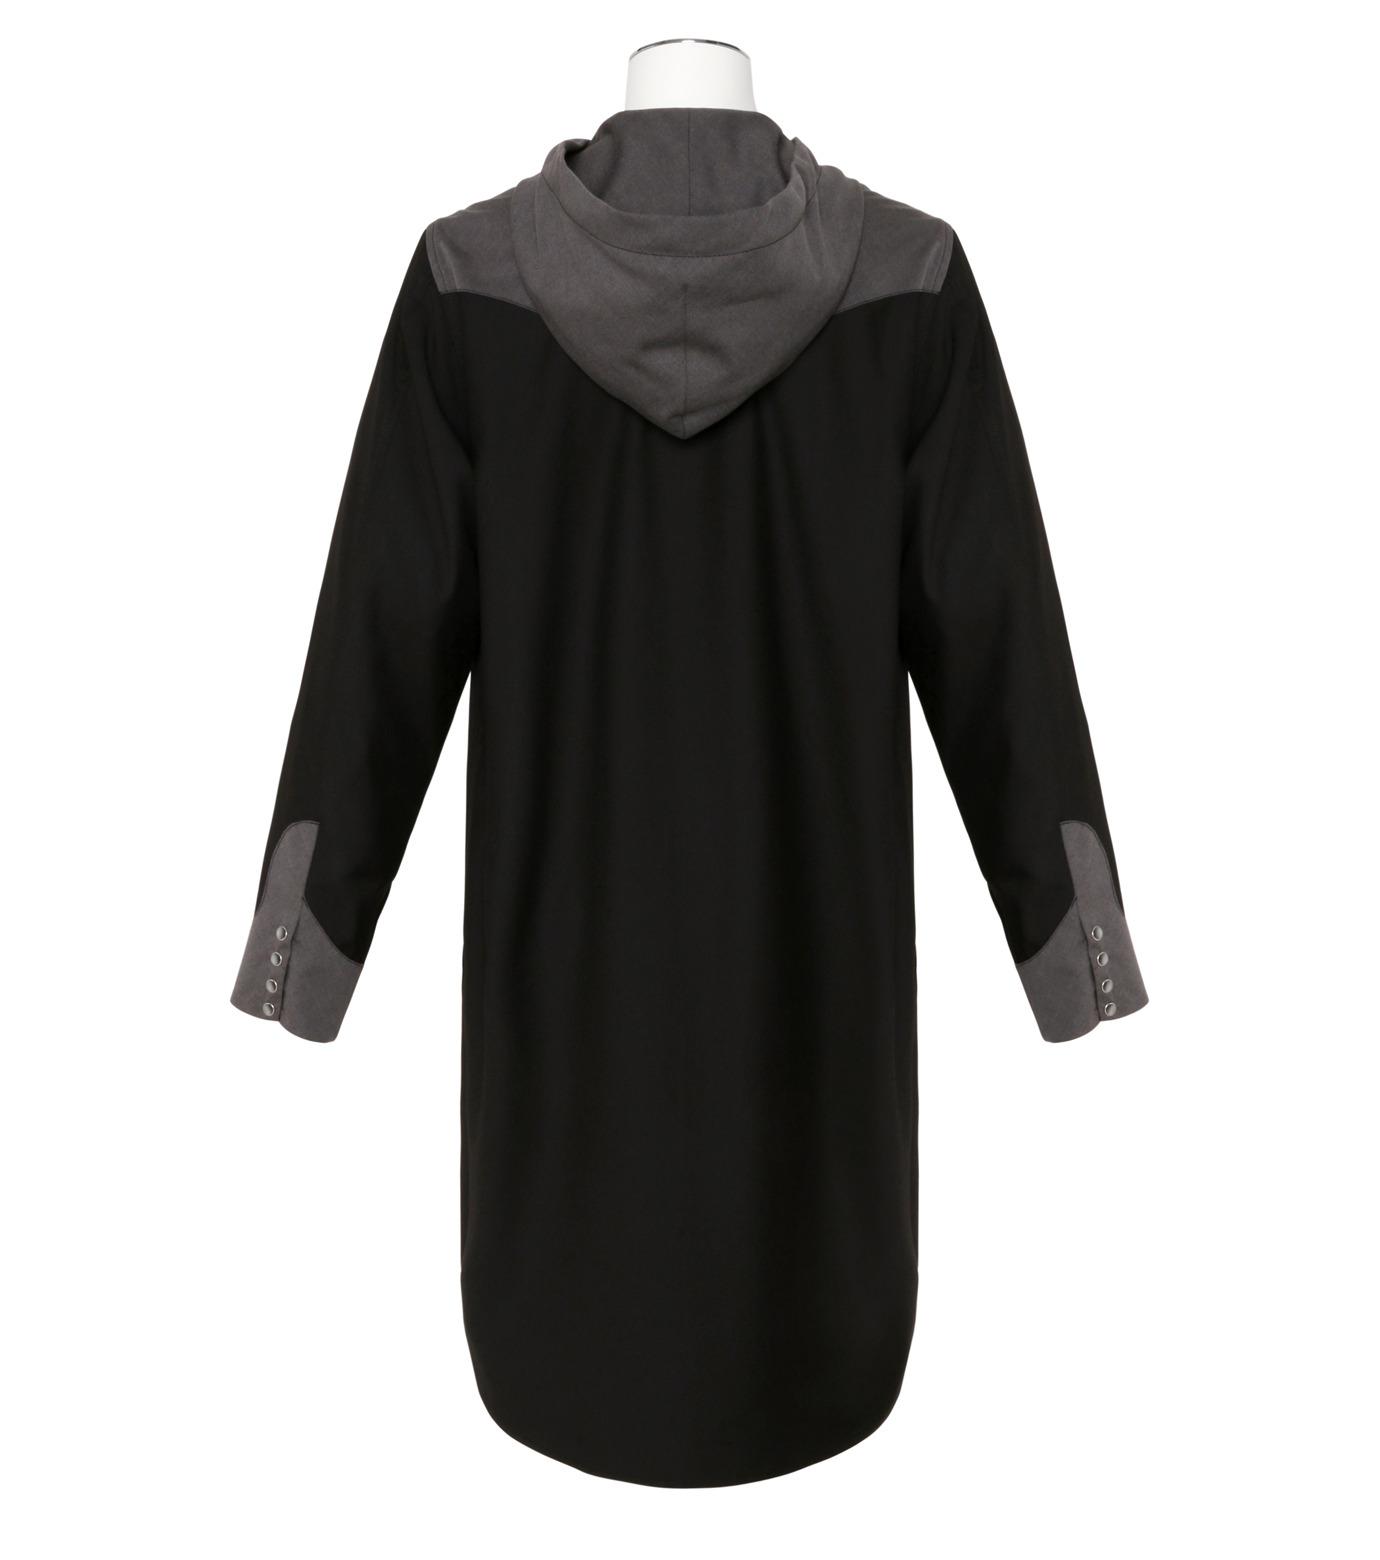 KIDILL(キディル)のWestern Hooded Shirt-BLACK(シャツ/shirt)-KL160-13 拡大詳細画像2